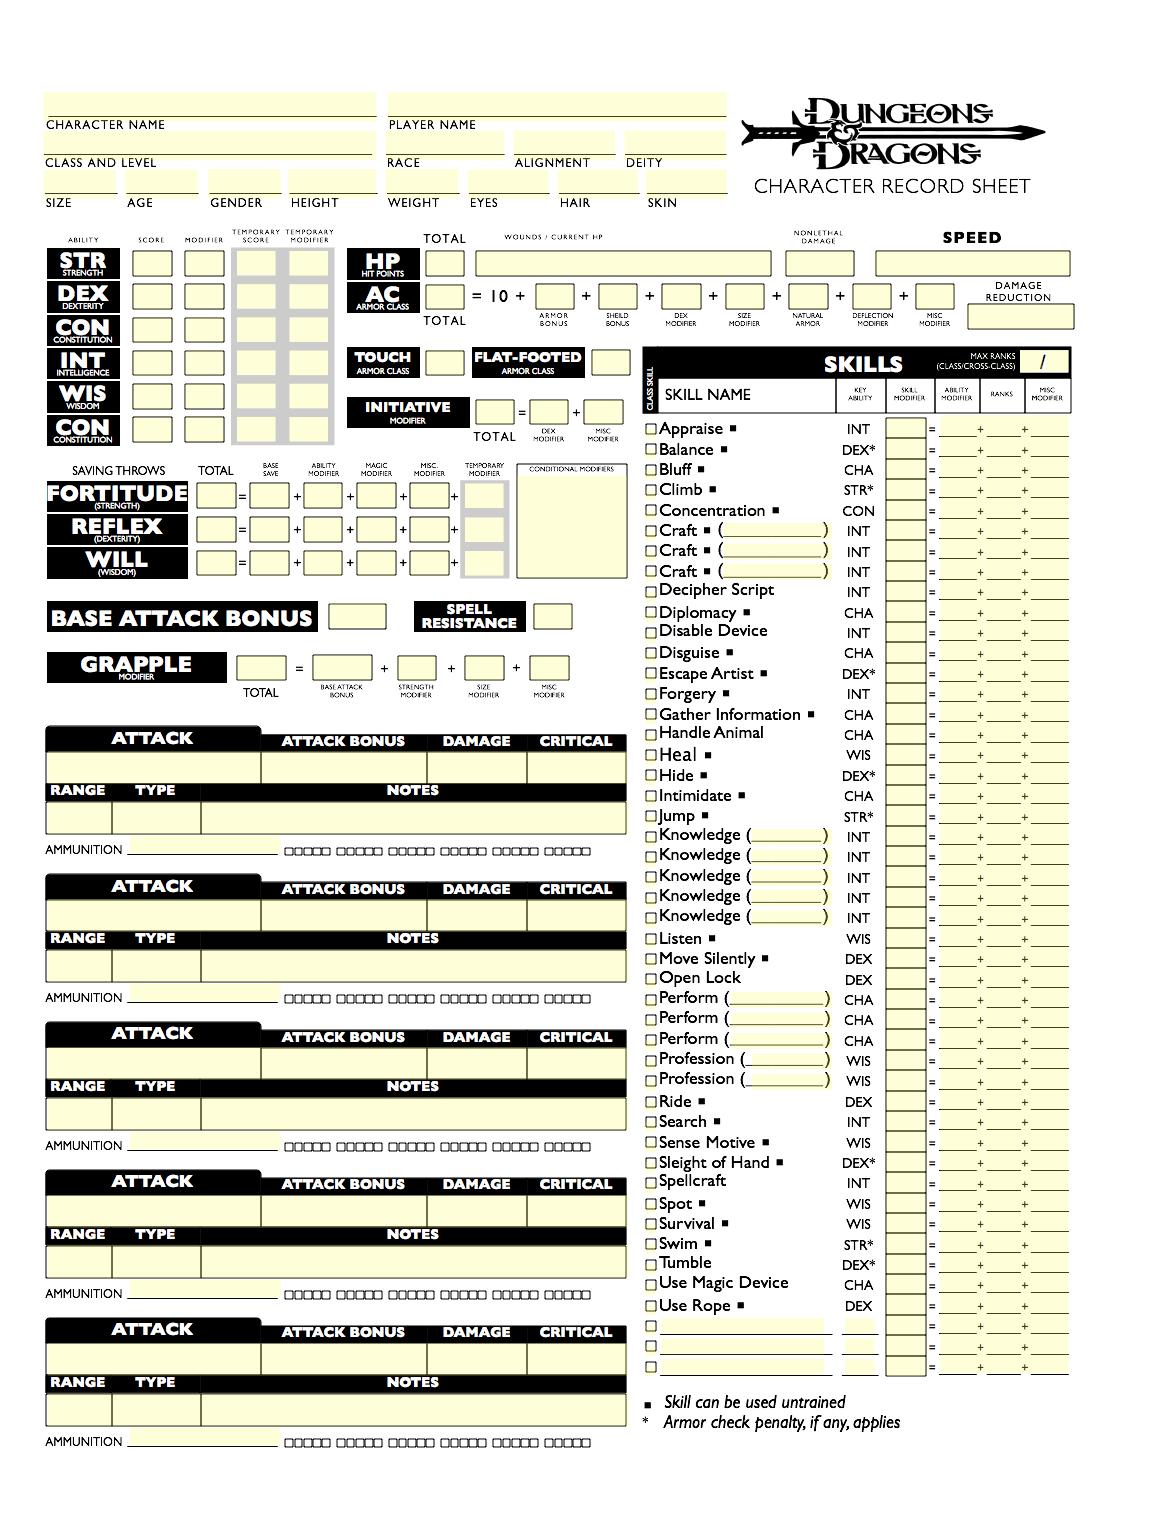 D&D 3.5 Spielerhandbuch Pdf